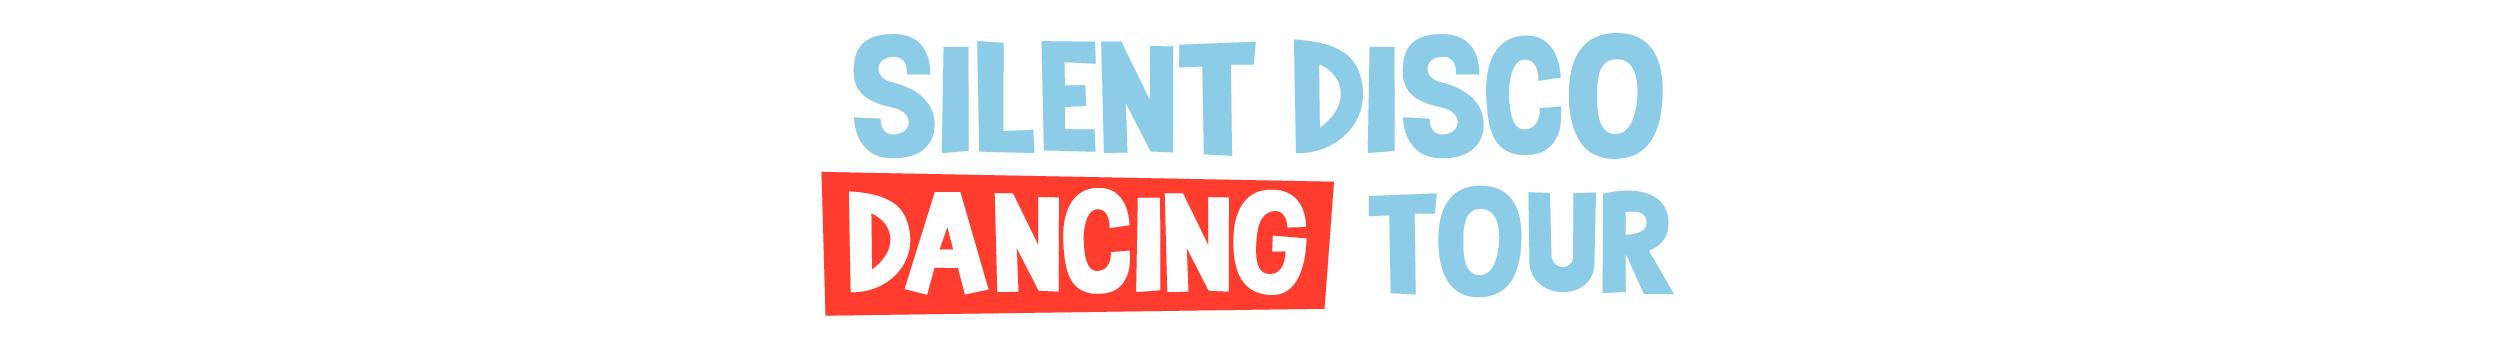 Silent Disco Dancing Tour · Merch